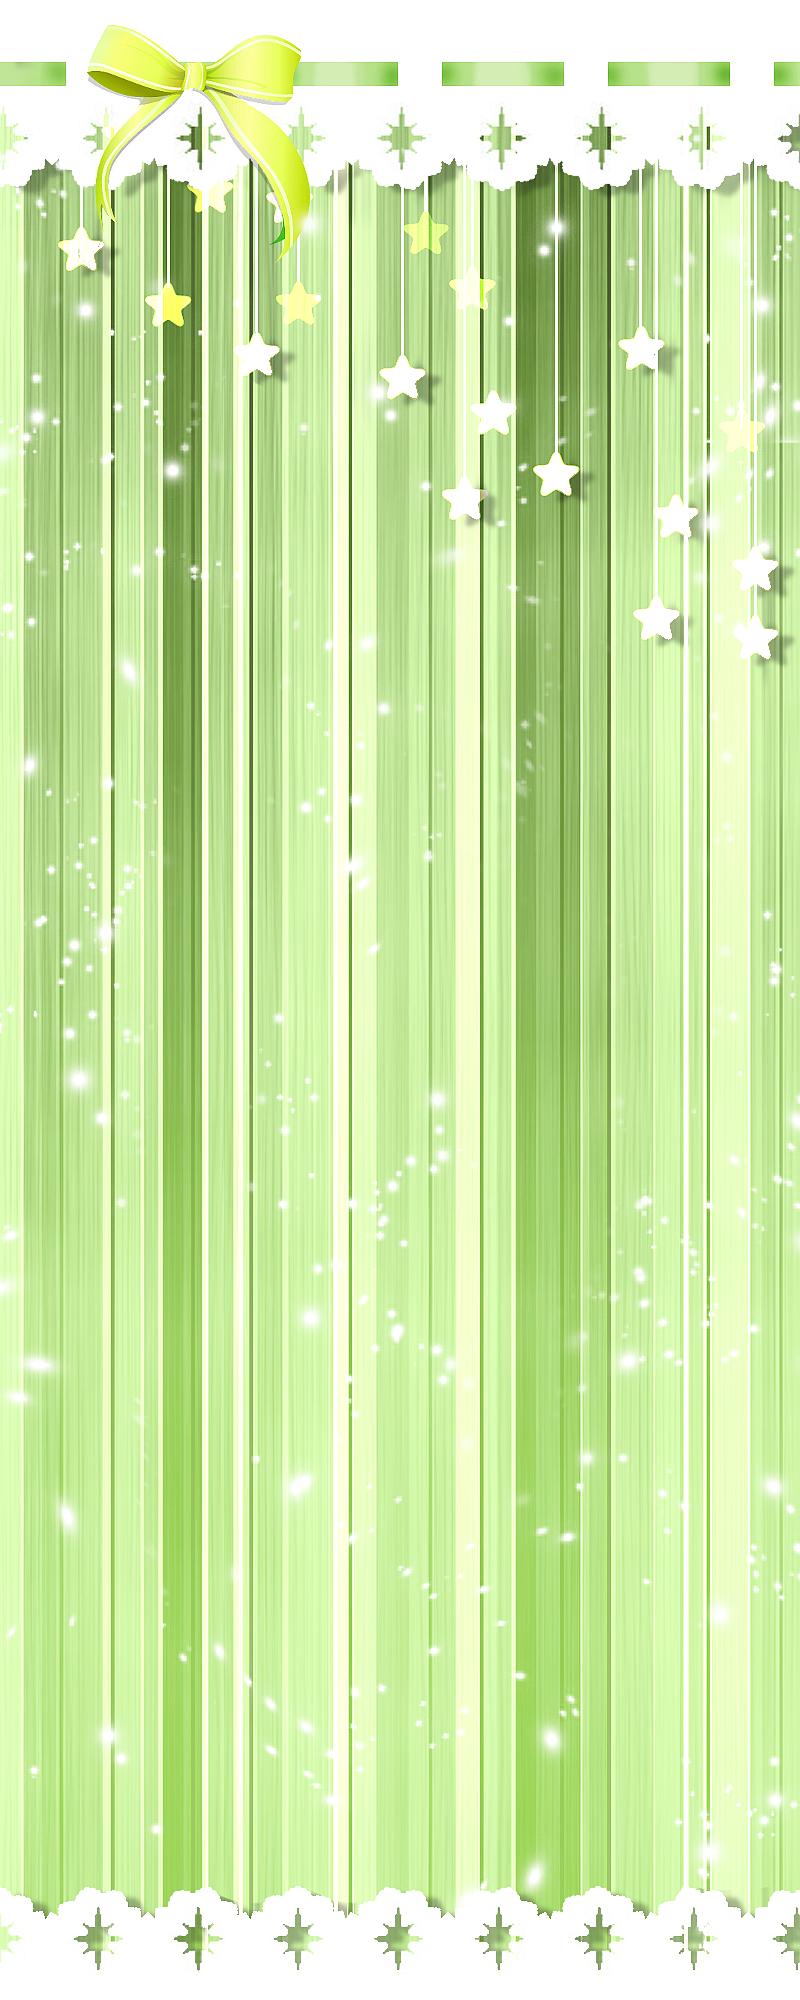 [FREE] Custom box: refreshing dream by Noori-mii